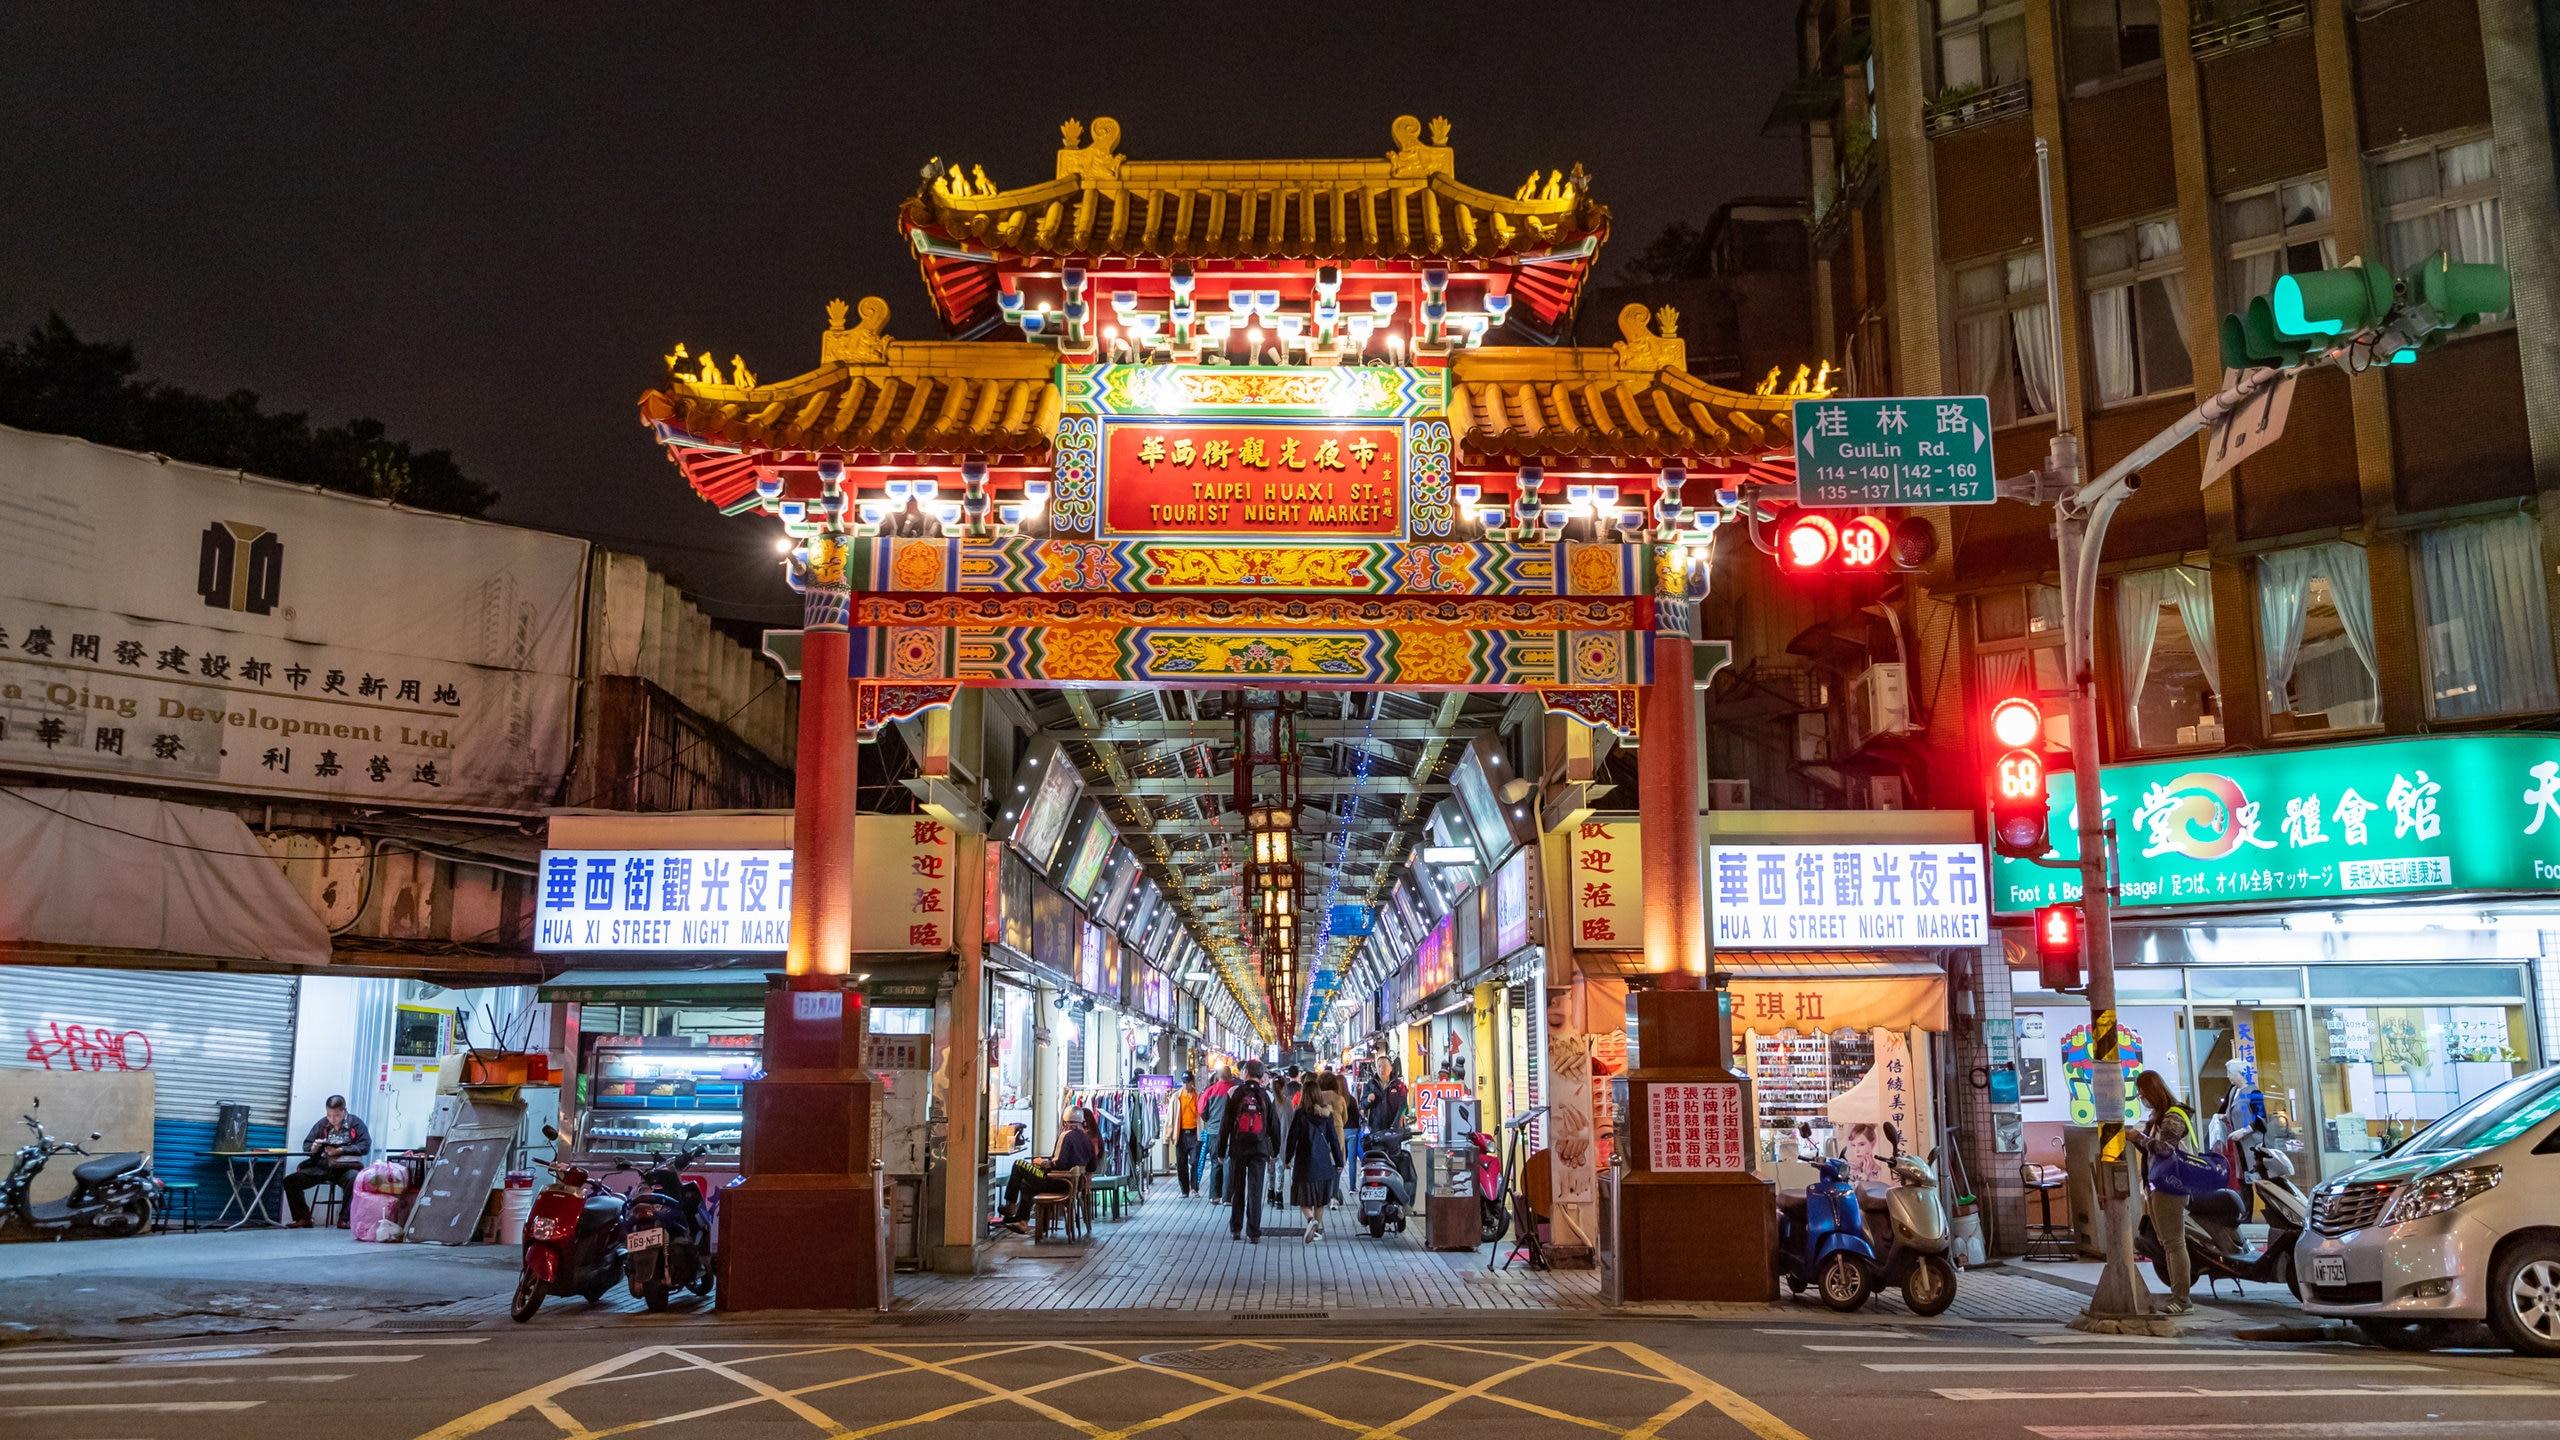 Nachtmarkt Huaxi Street, Taipeh, Taiwan